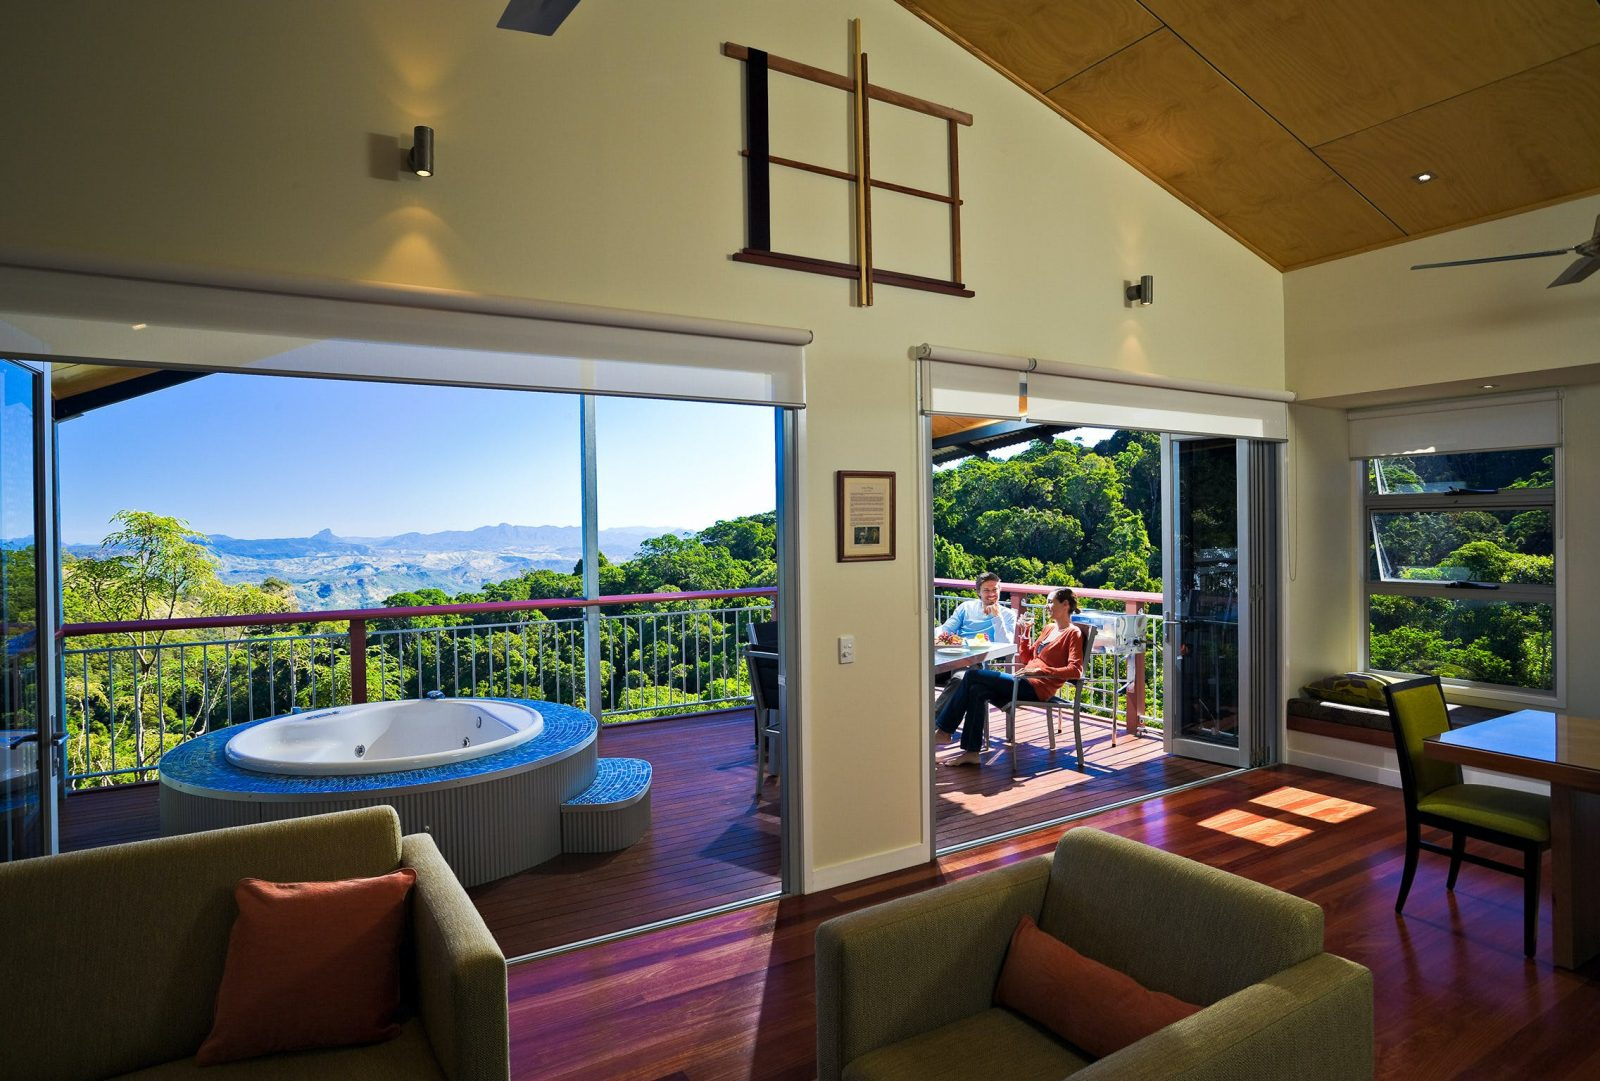 O'Reilly's Villas Valley View